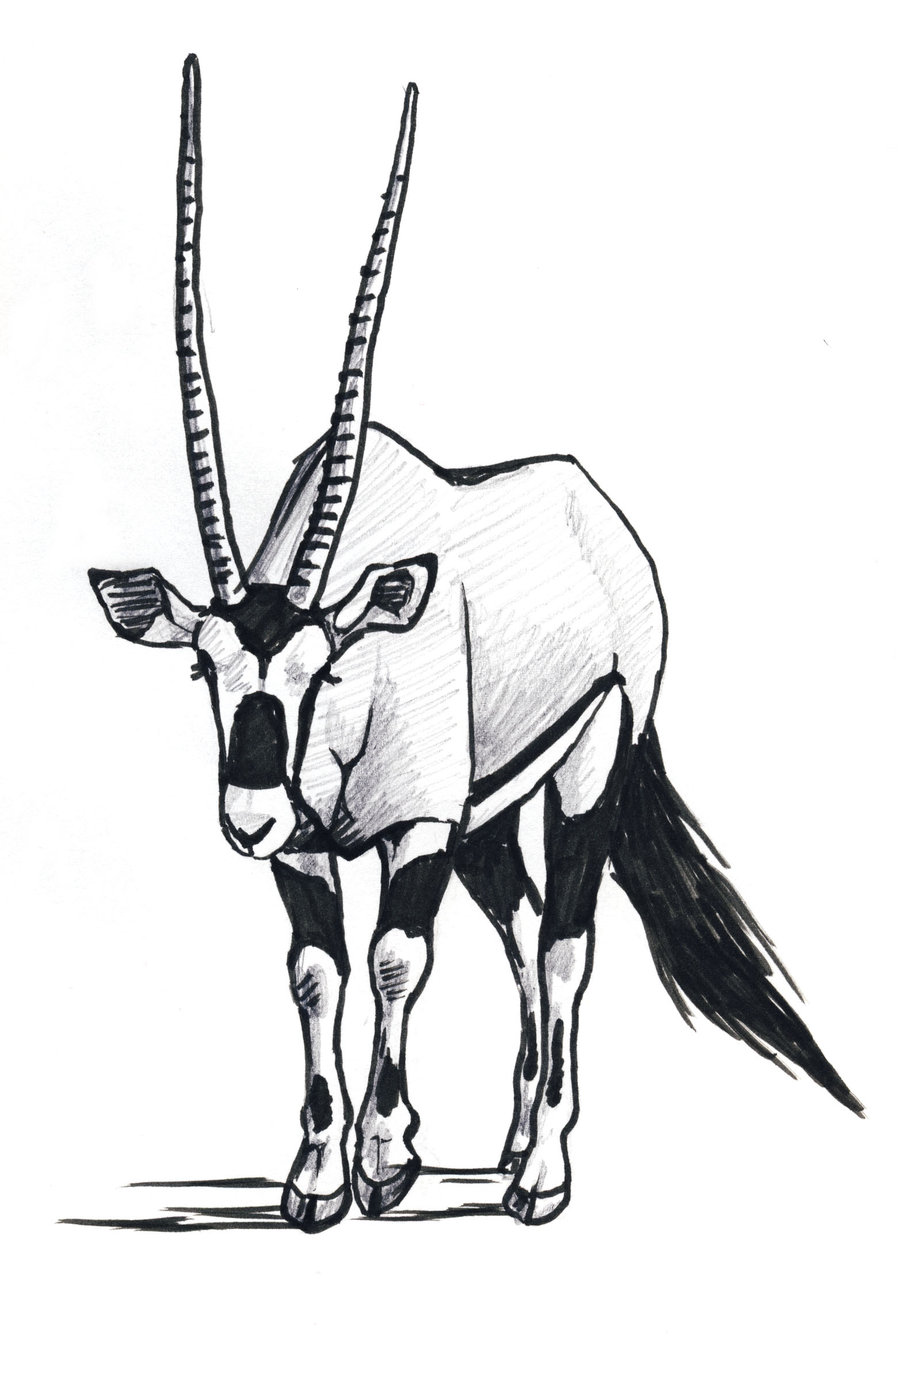 Oryx clipart arabian oryx Arabian photo#6 oryx Oryx drawing